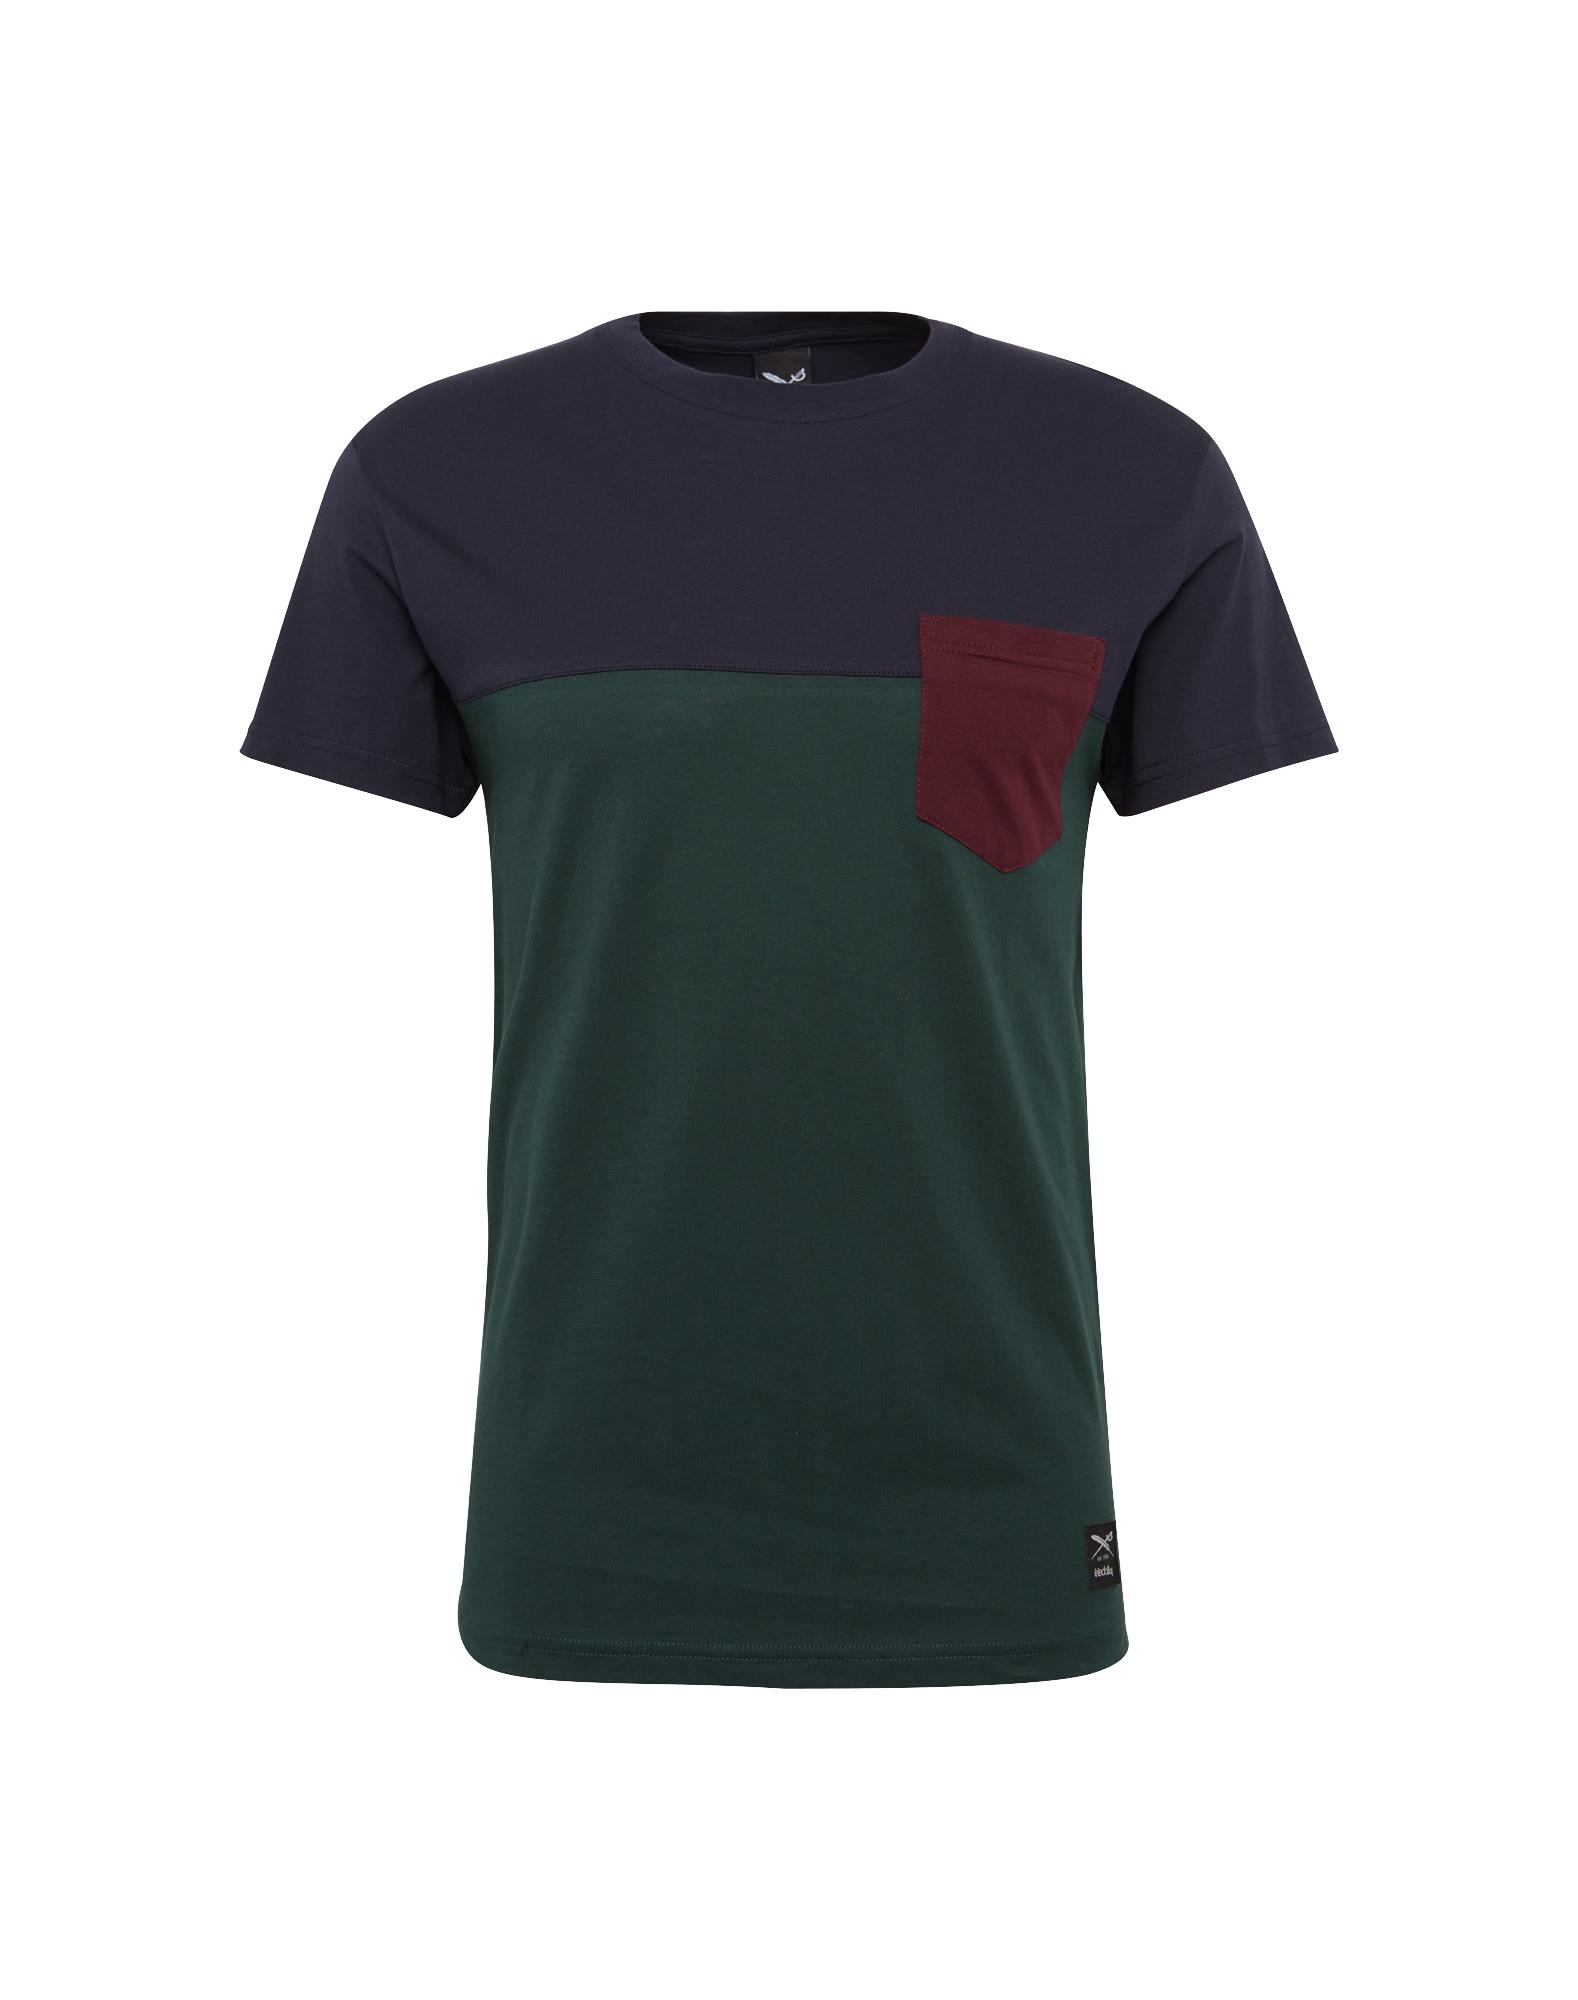 Tričko tmavě modrá tmavě zelená bordó Iriedaily